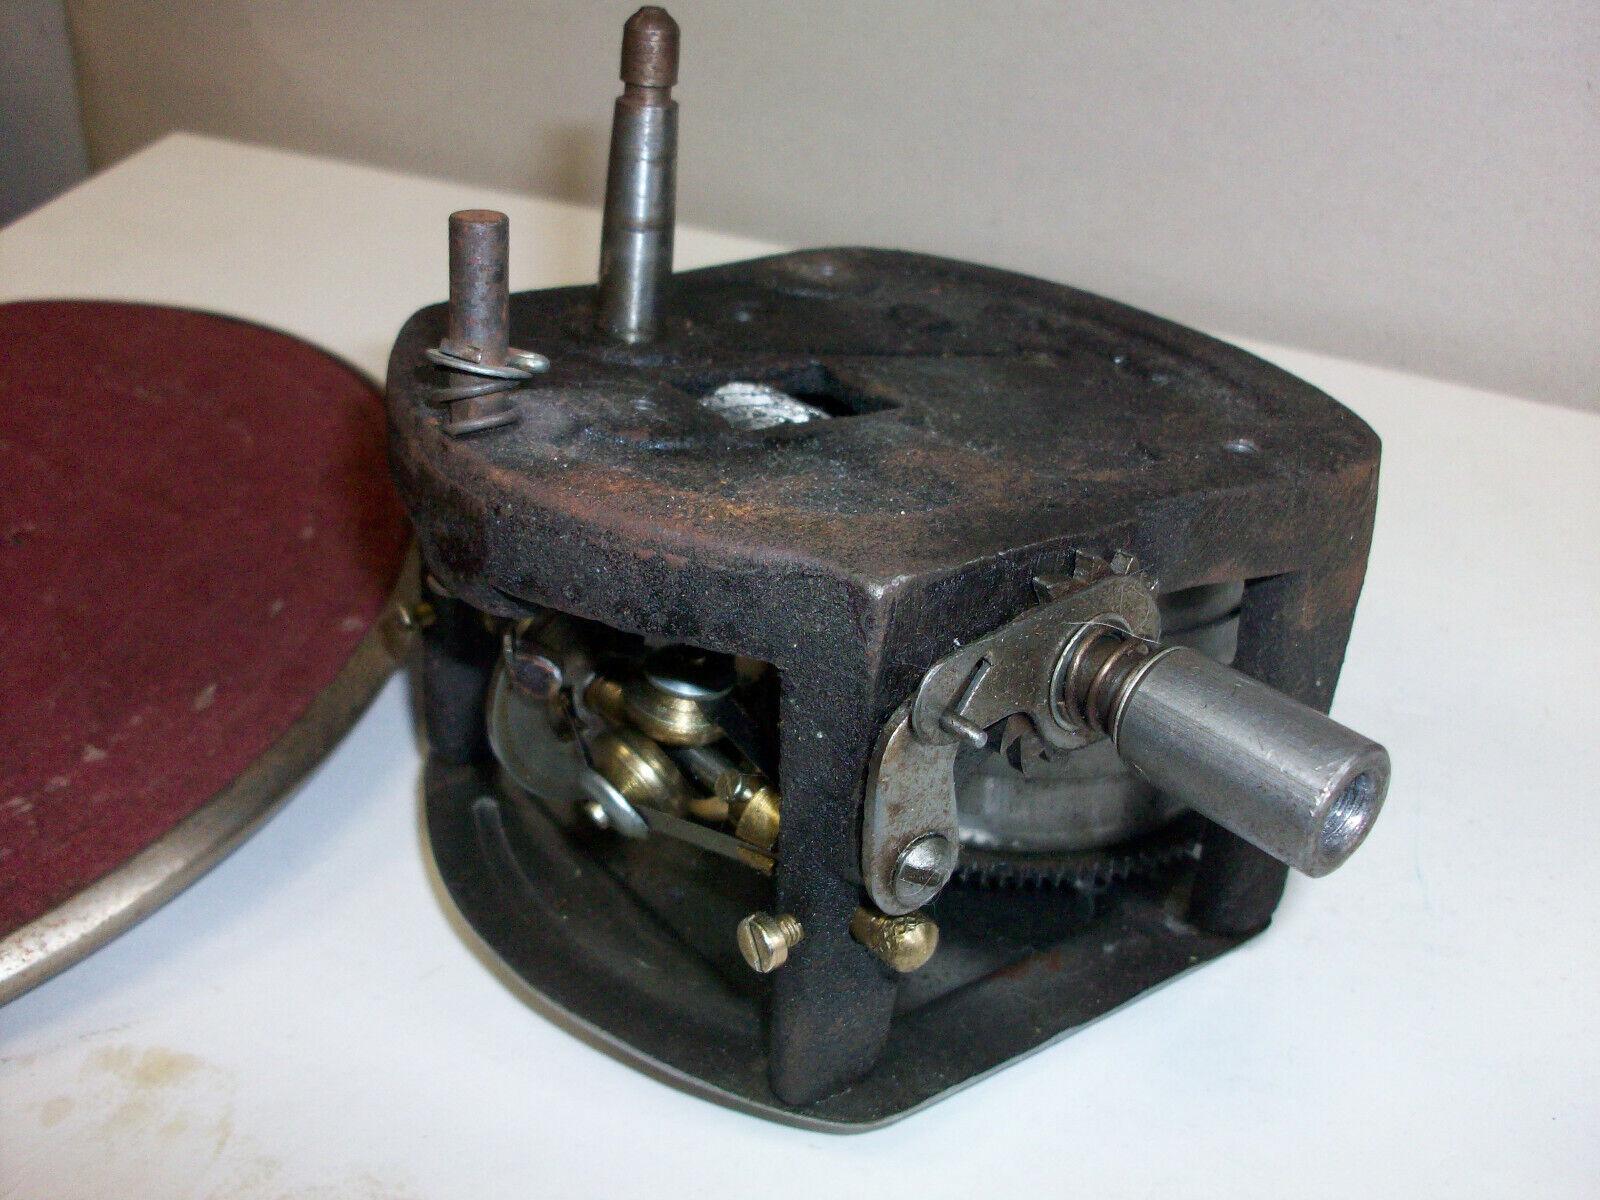 alter Grammophon Motor Antrieb Musik HIS MASTERS VOICE mit Plattenteller